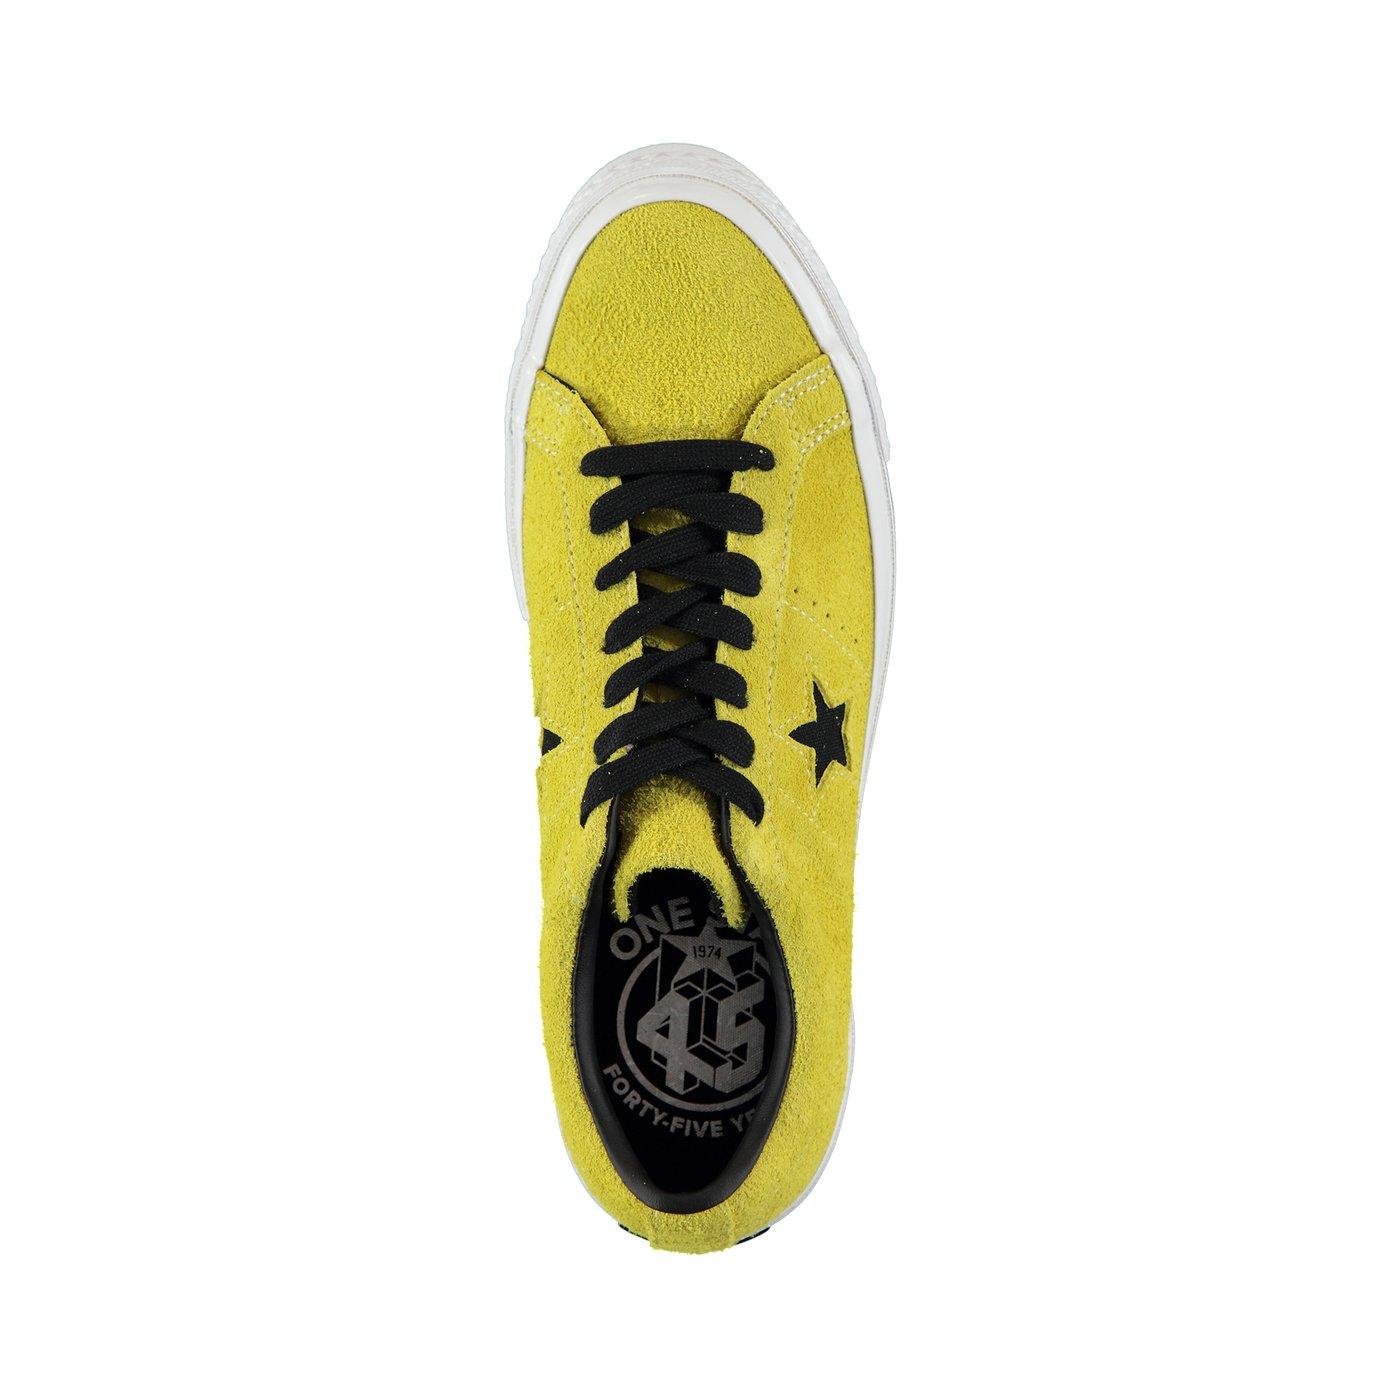 Converse One Star Dark Star Vintage Suede Erkek Sarı Sneaker